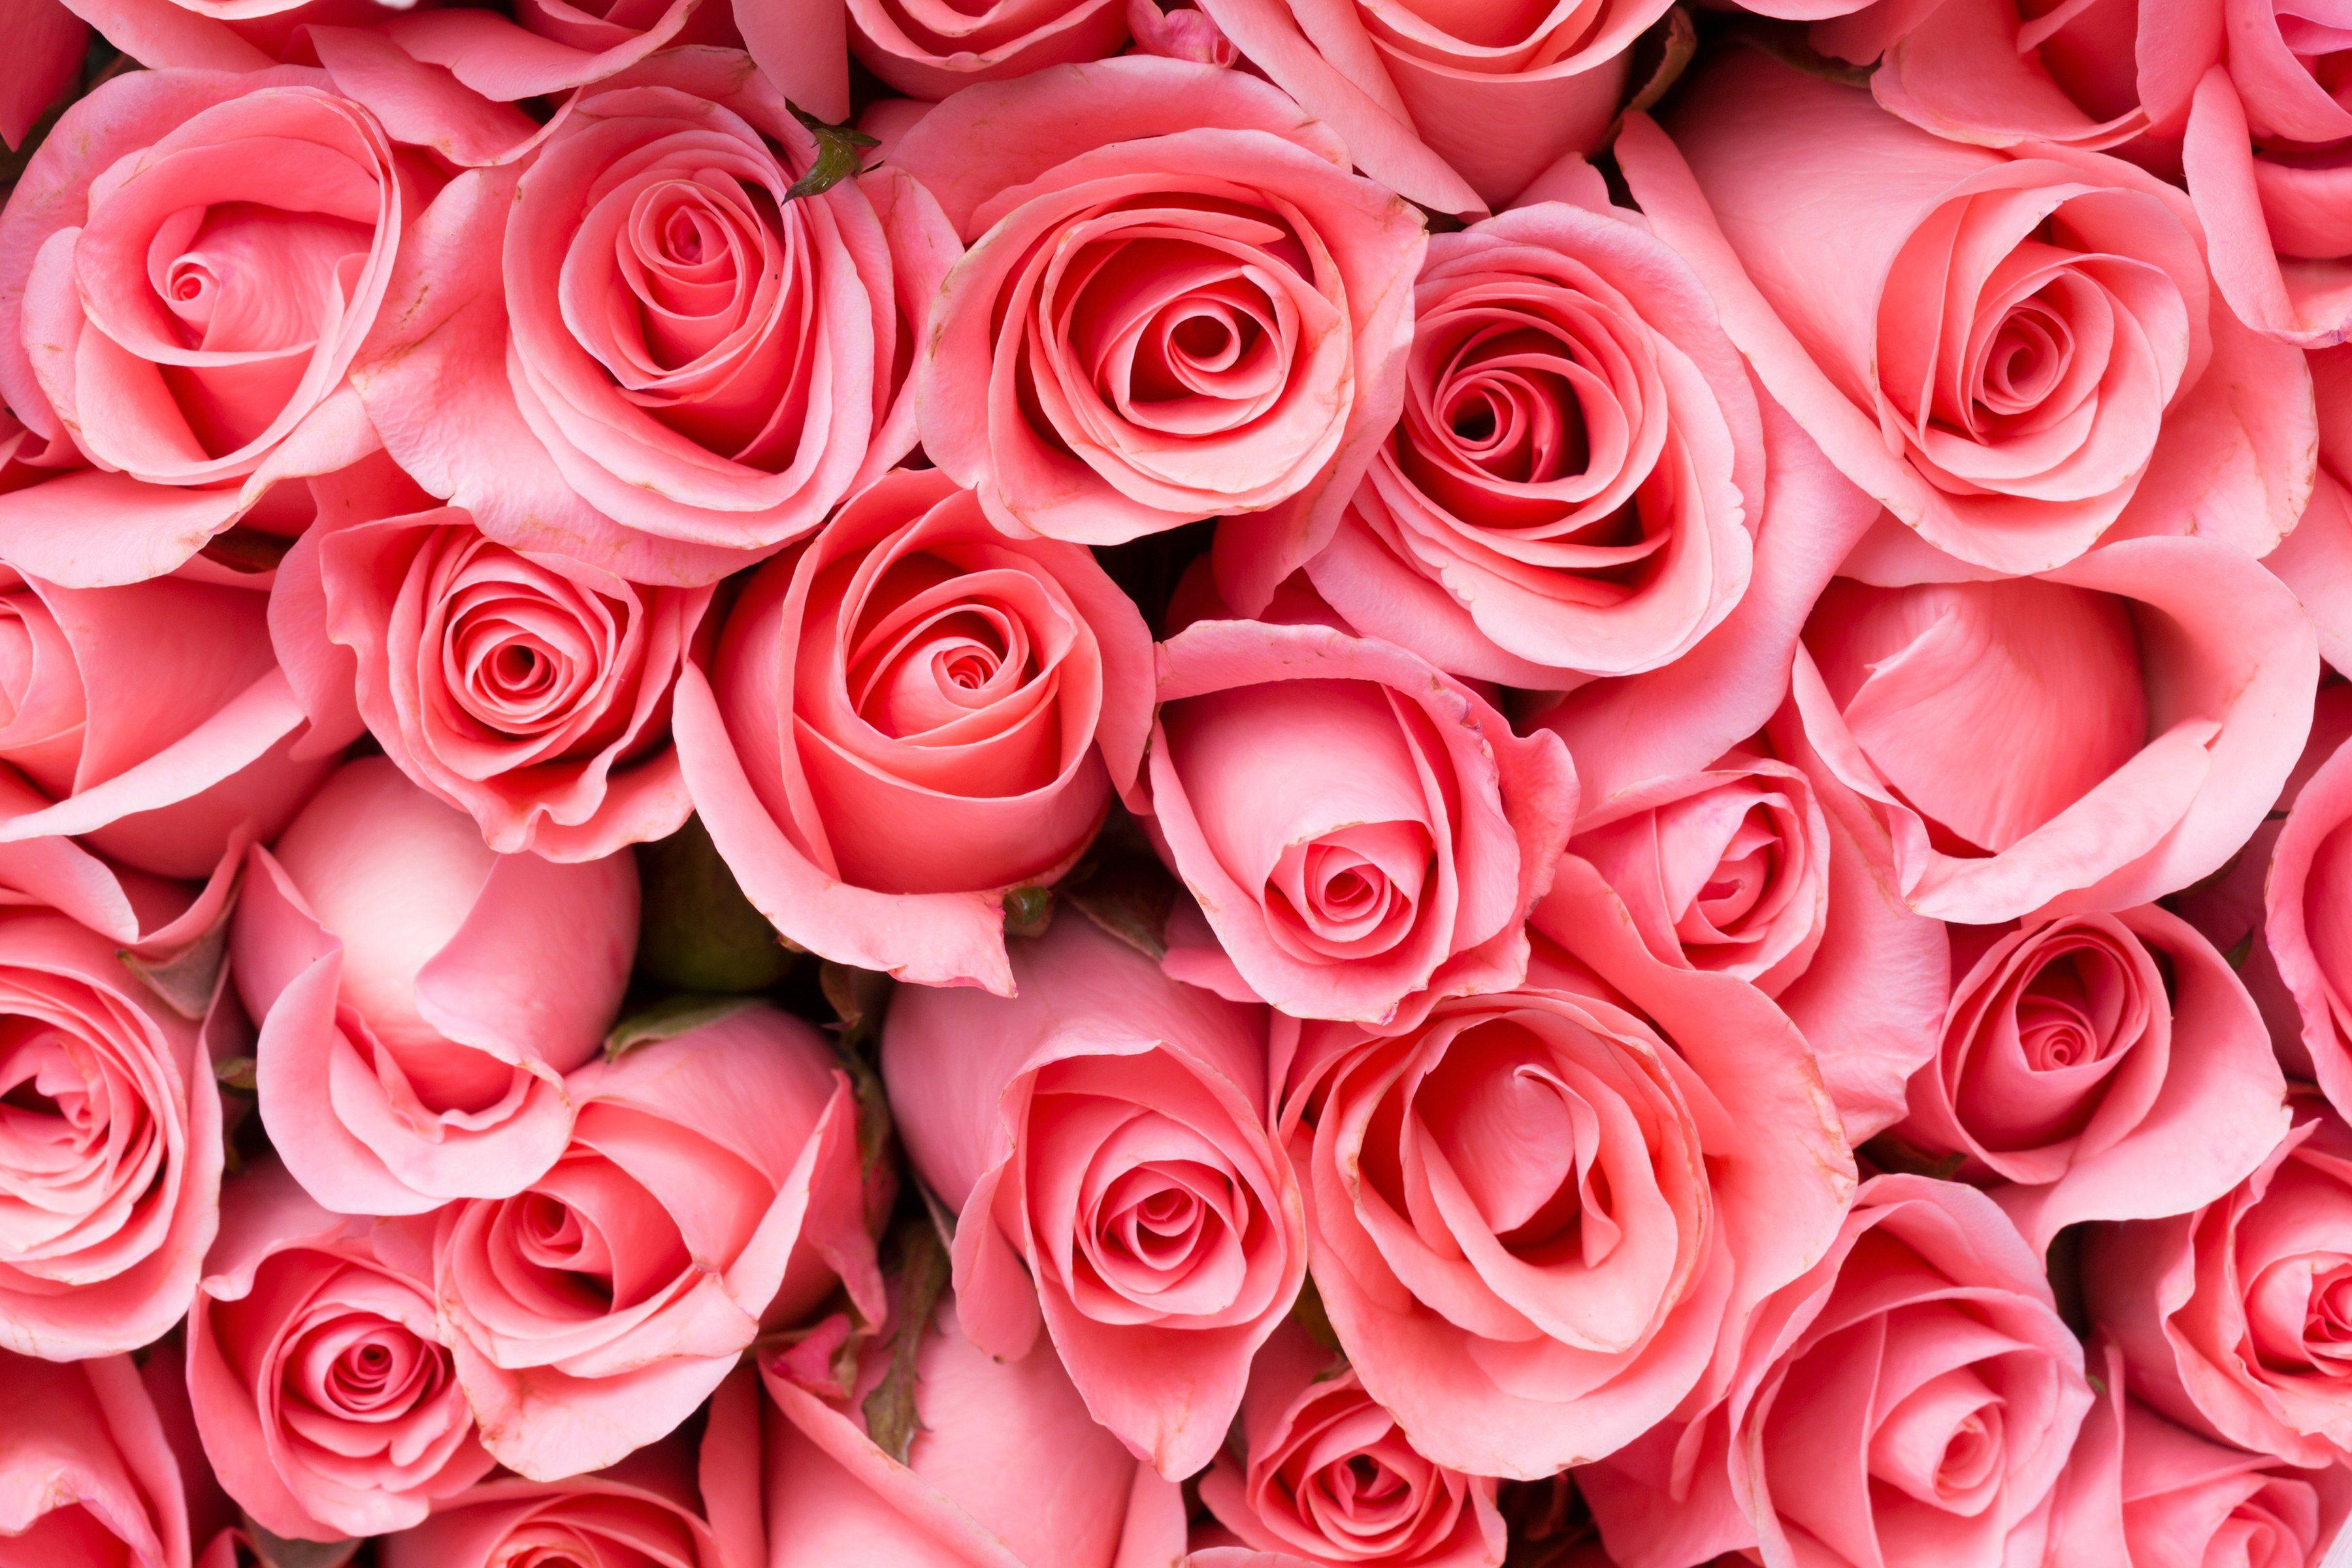 PAPERMOON Fototapete »Pink Rose Flowers«, BlueBack, 7 Bahnen, 350 x 260 cm